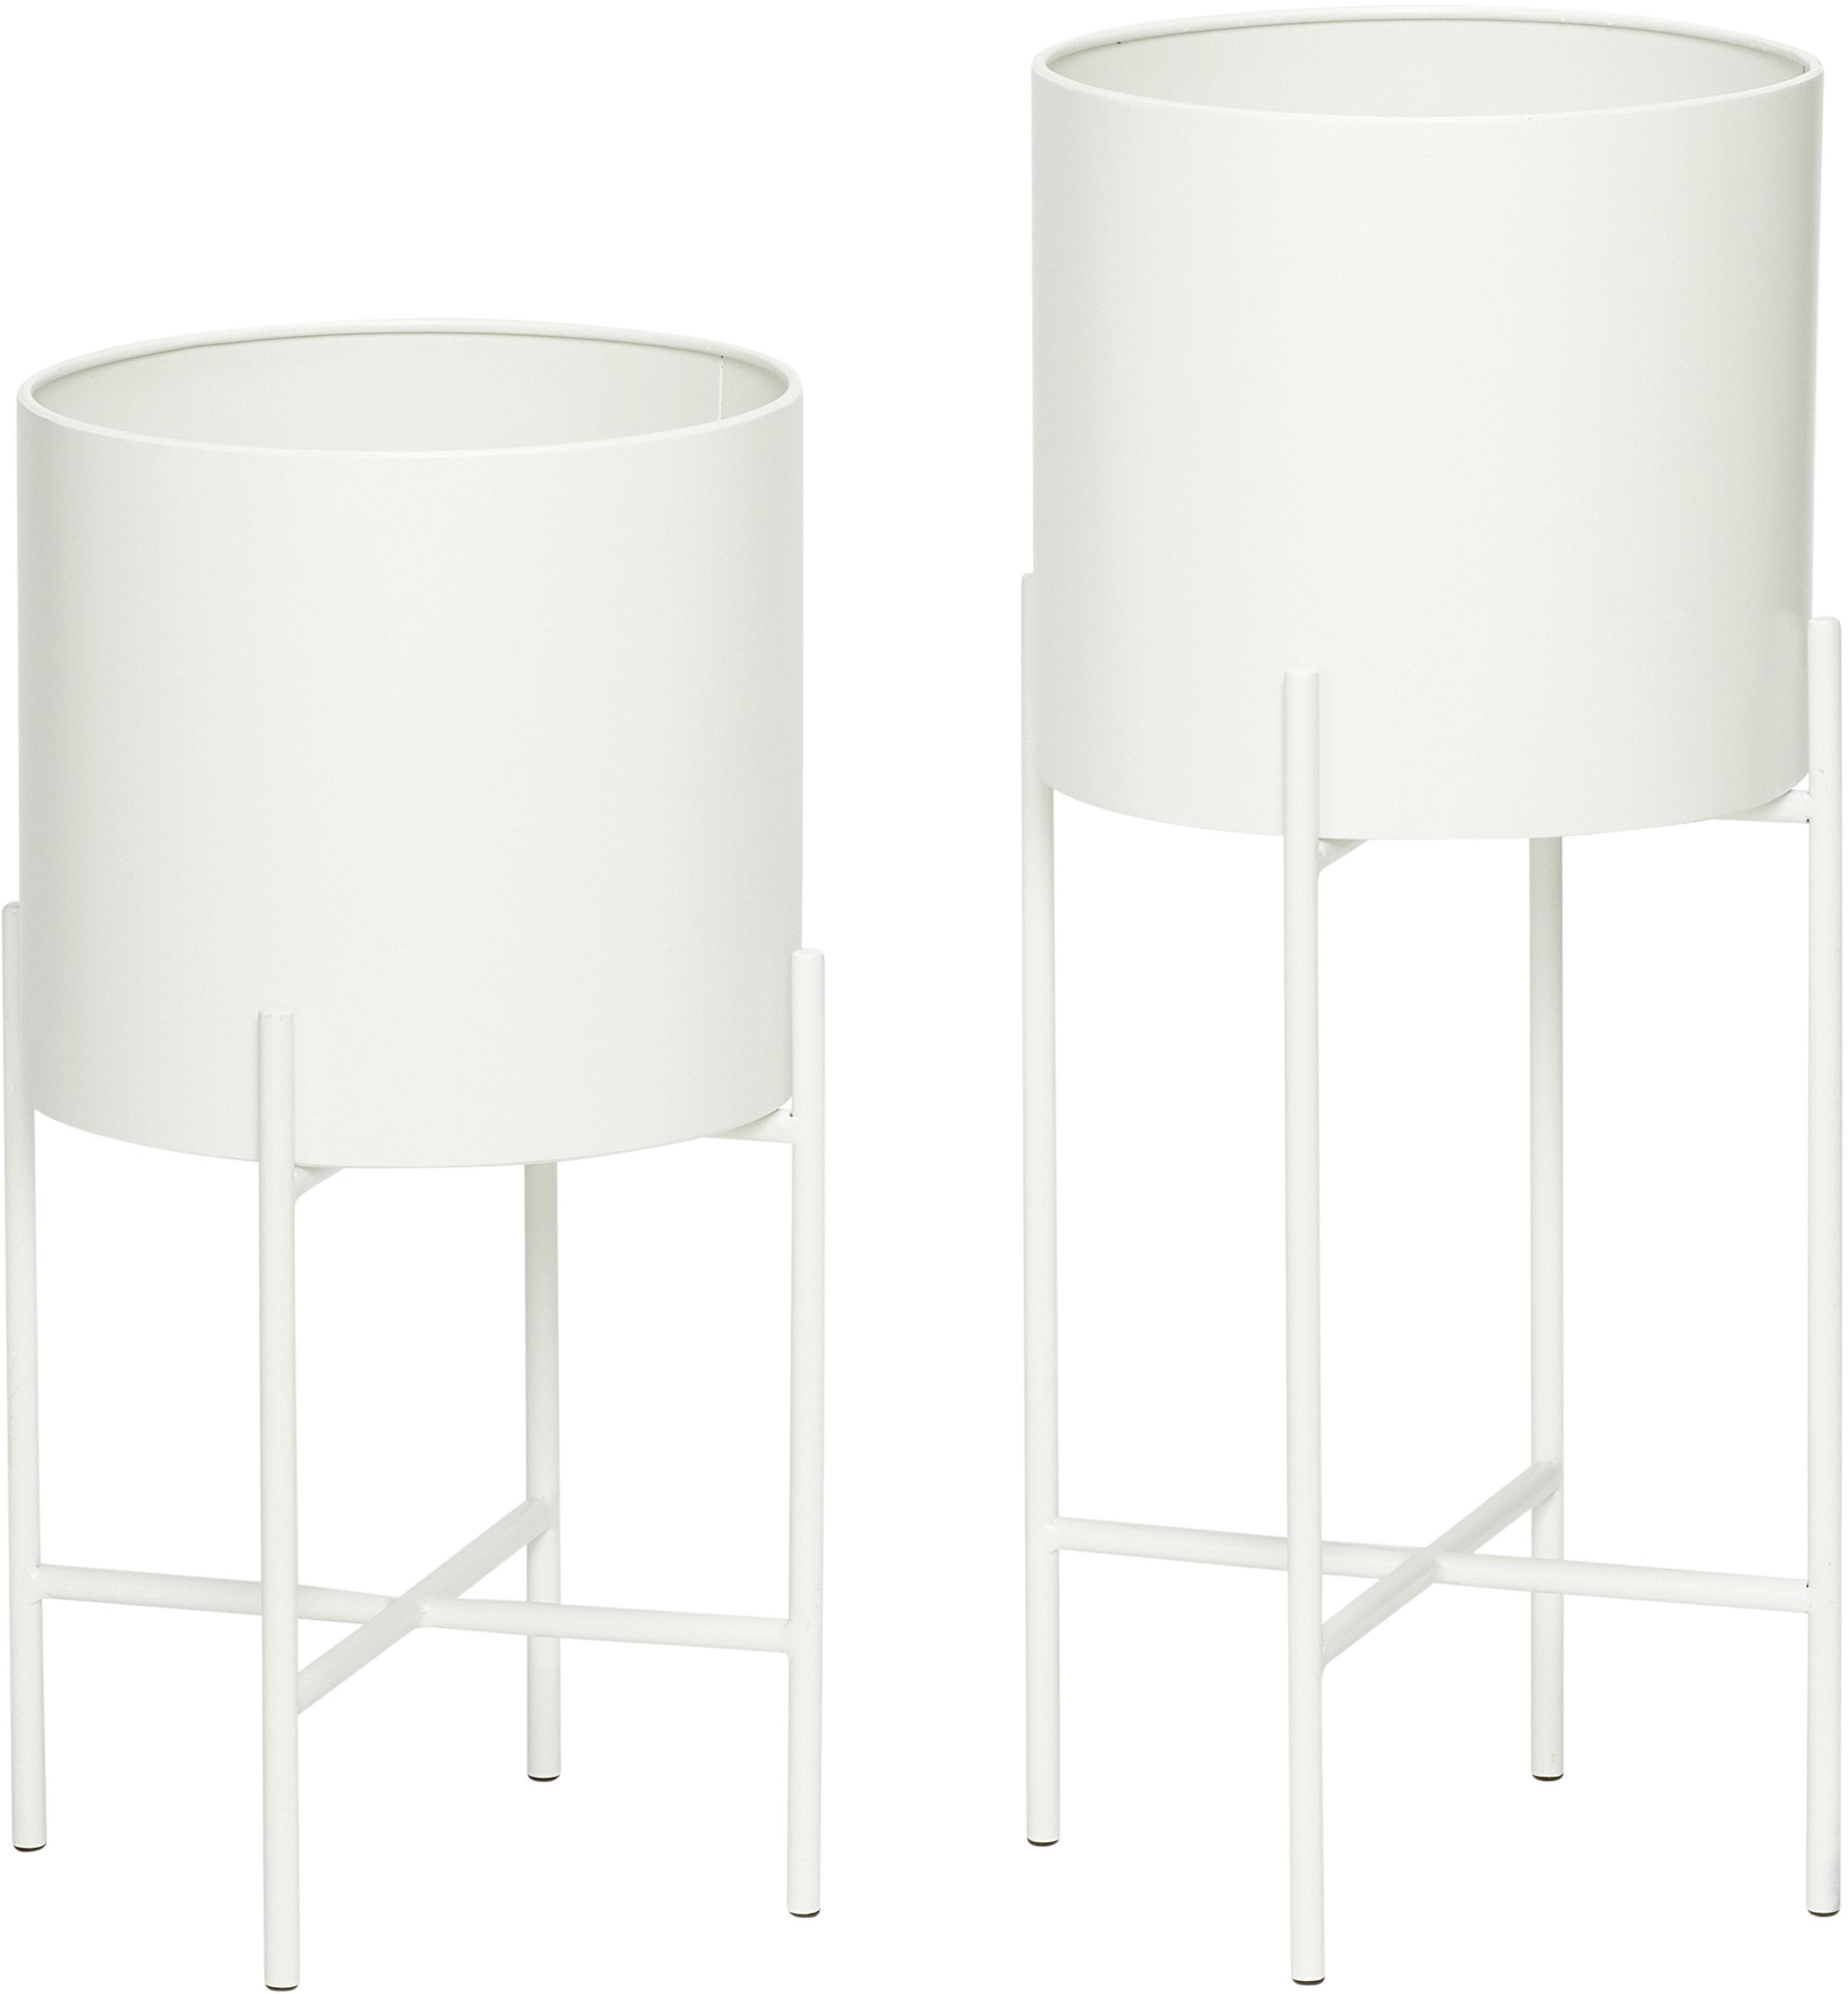 Übertöpfe-Set Mina, 2-tlg., Metall, Weiß, matt, Sondergrößen